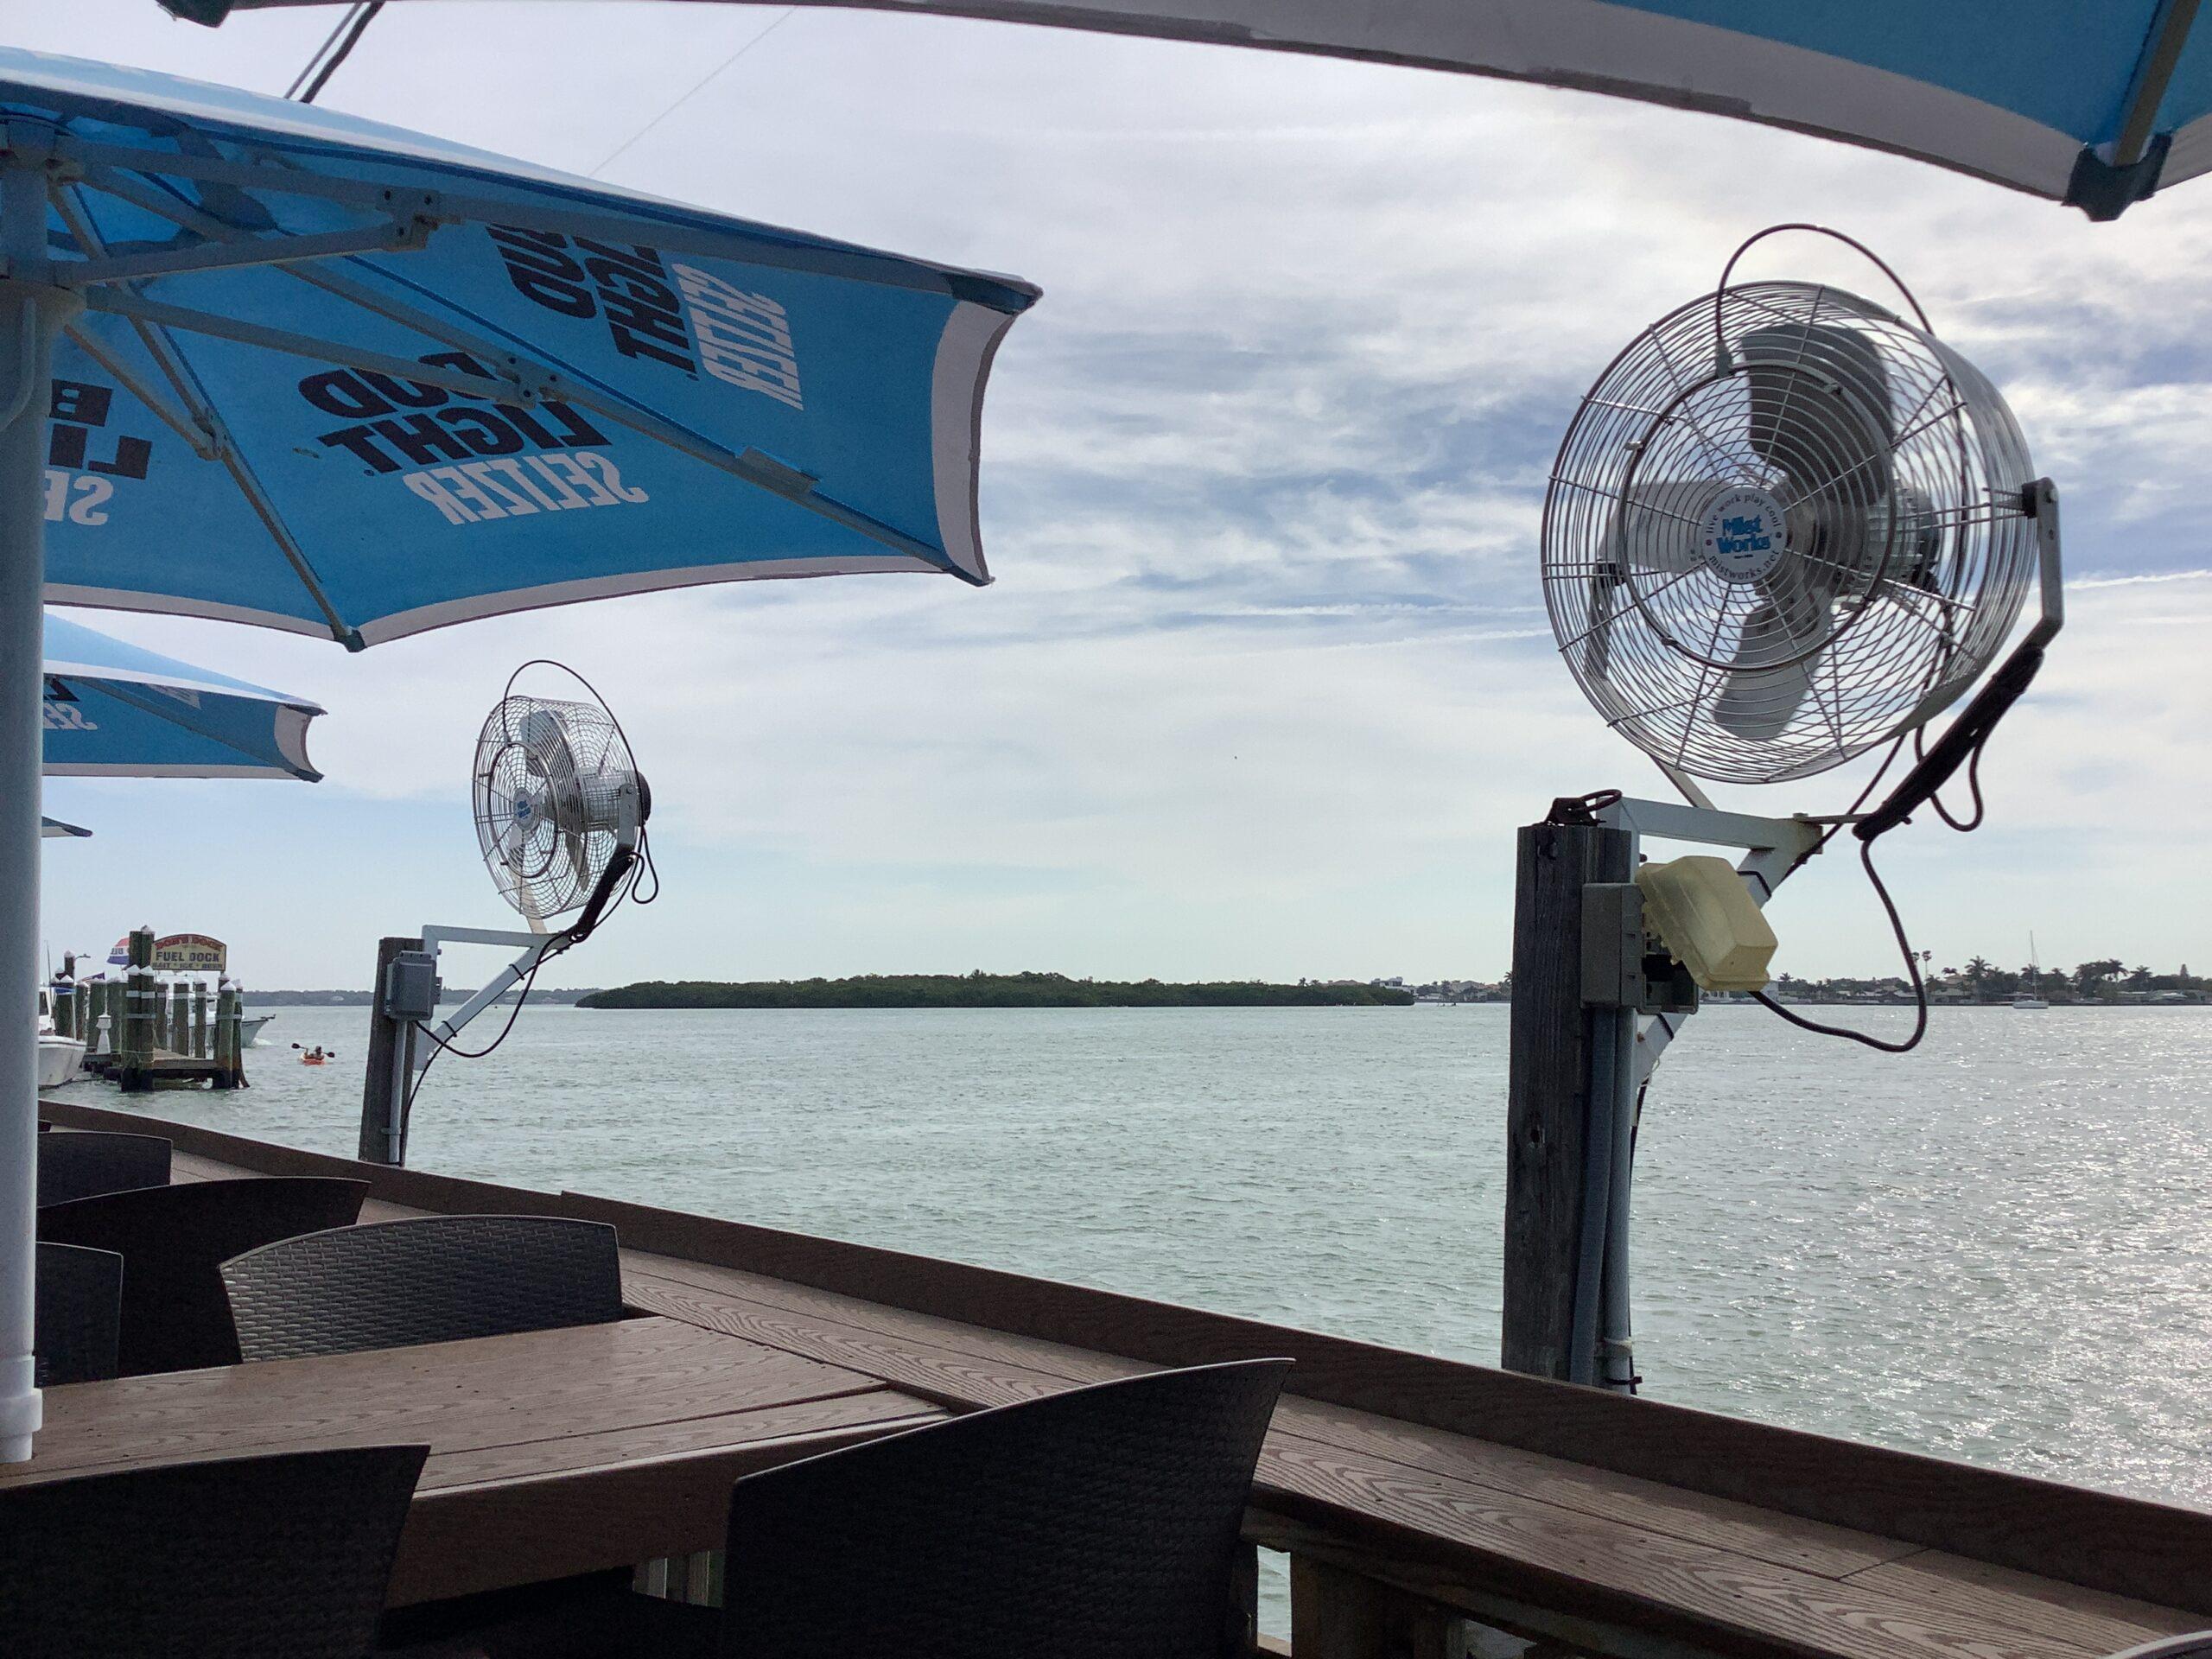 Sculley's Madeira Beach Mist Works Restaurant Misting system 2021 Florida